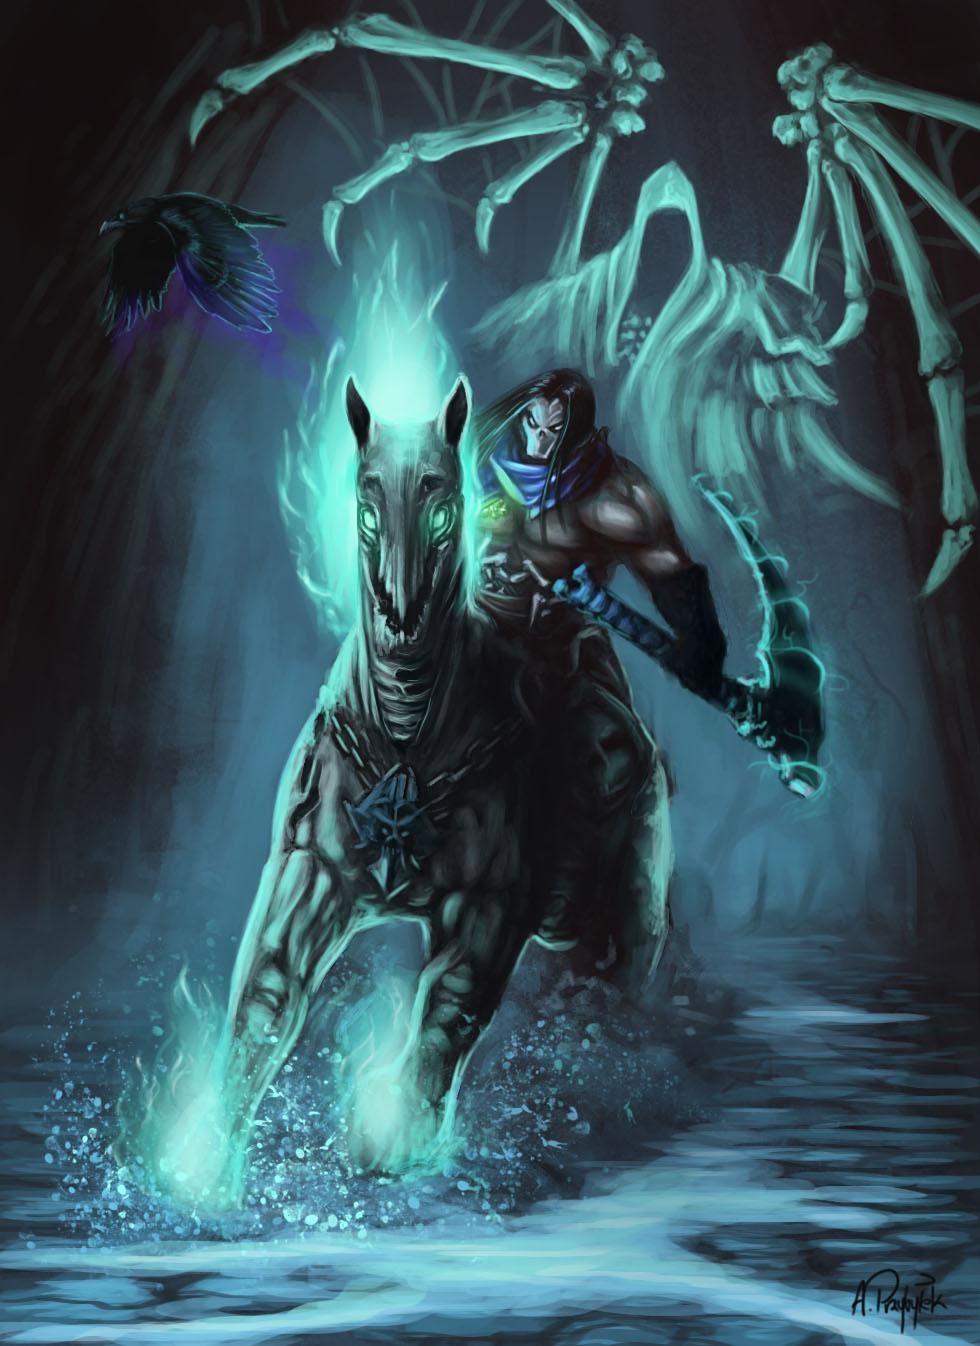 Darksiders Despair Darksiders 2 Fanart by...